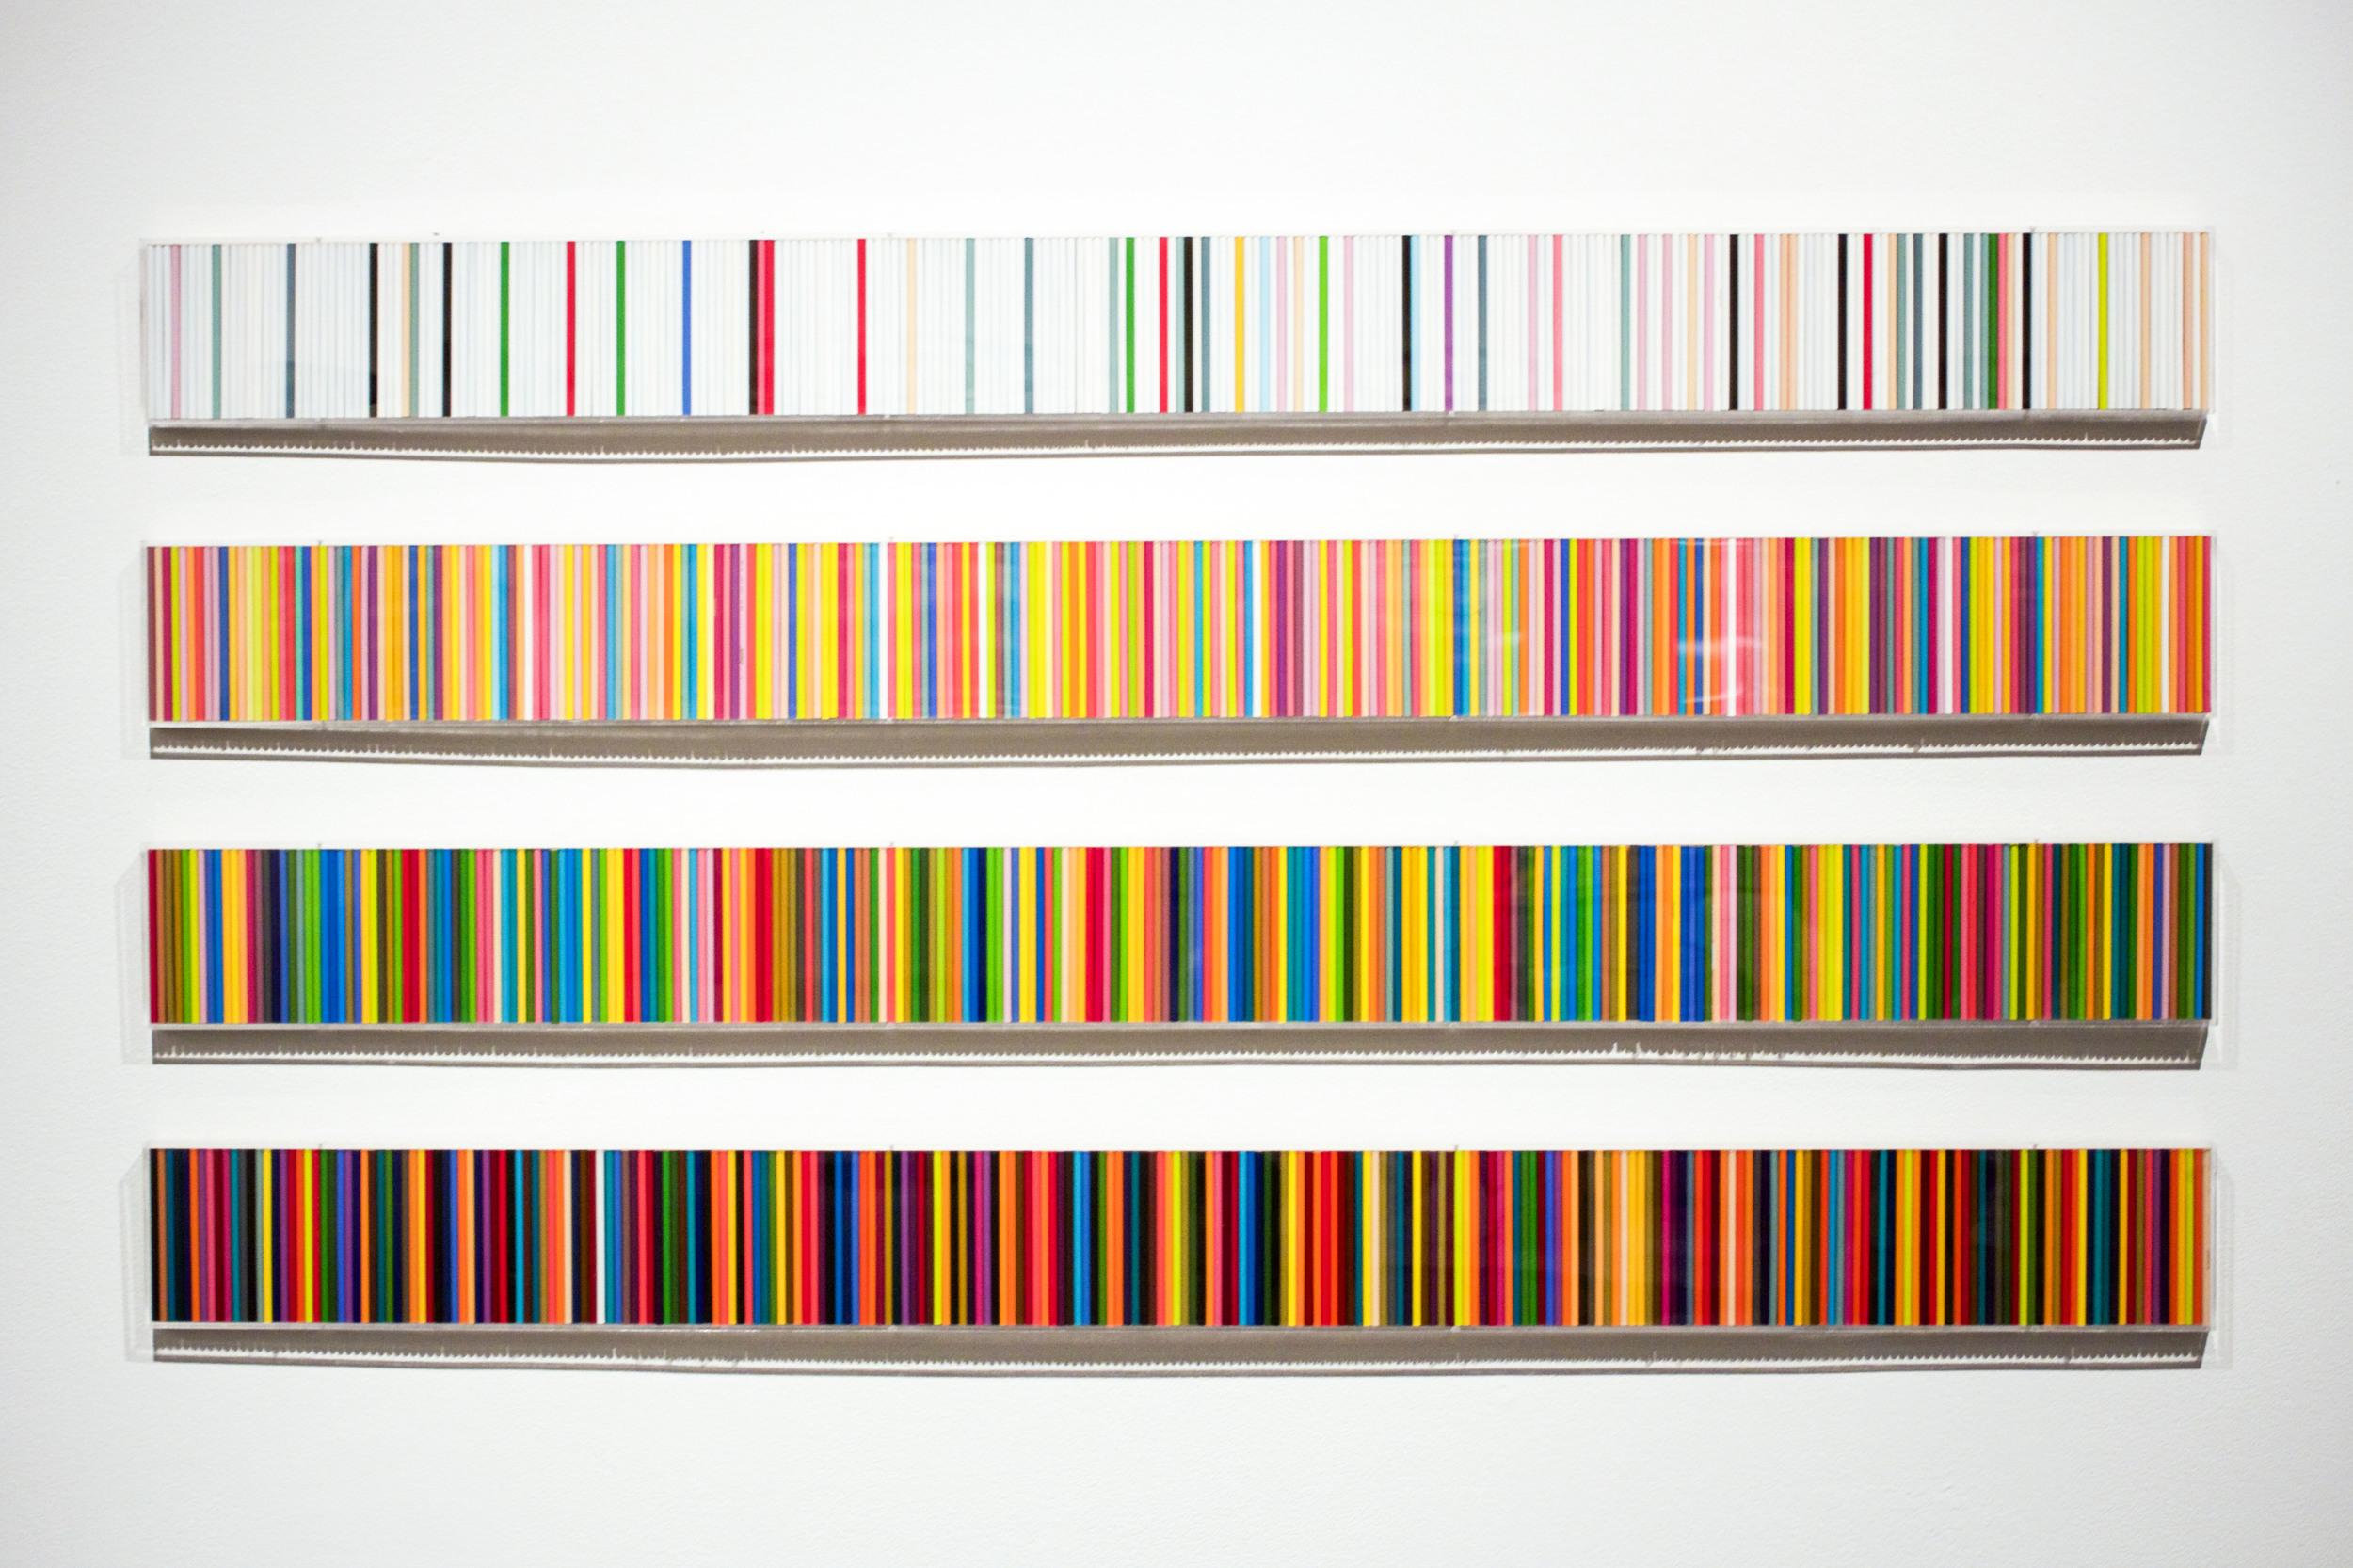 Spectra Four Seasons, 2010